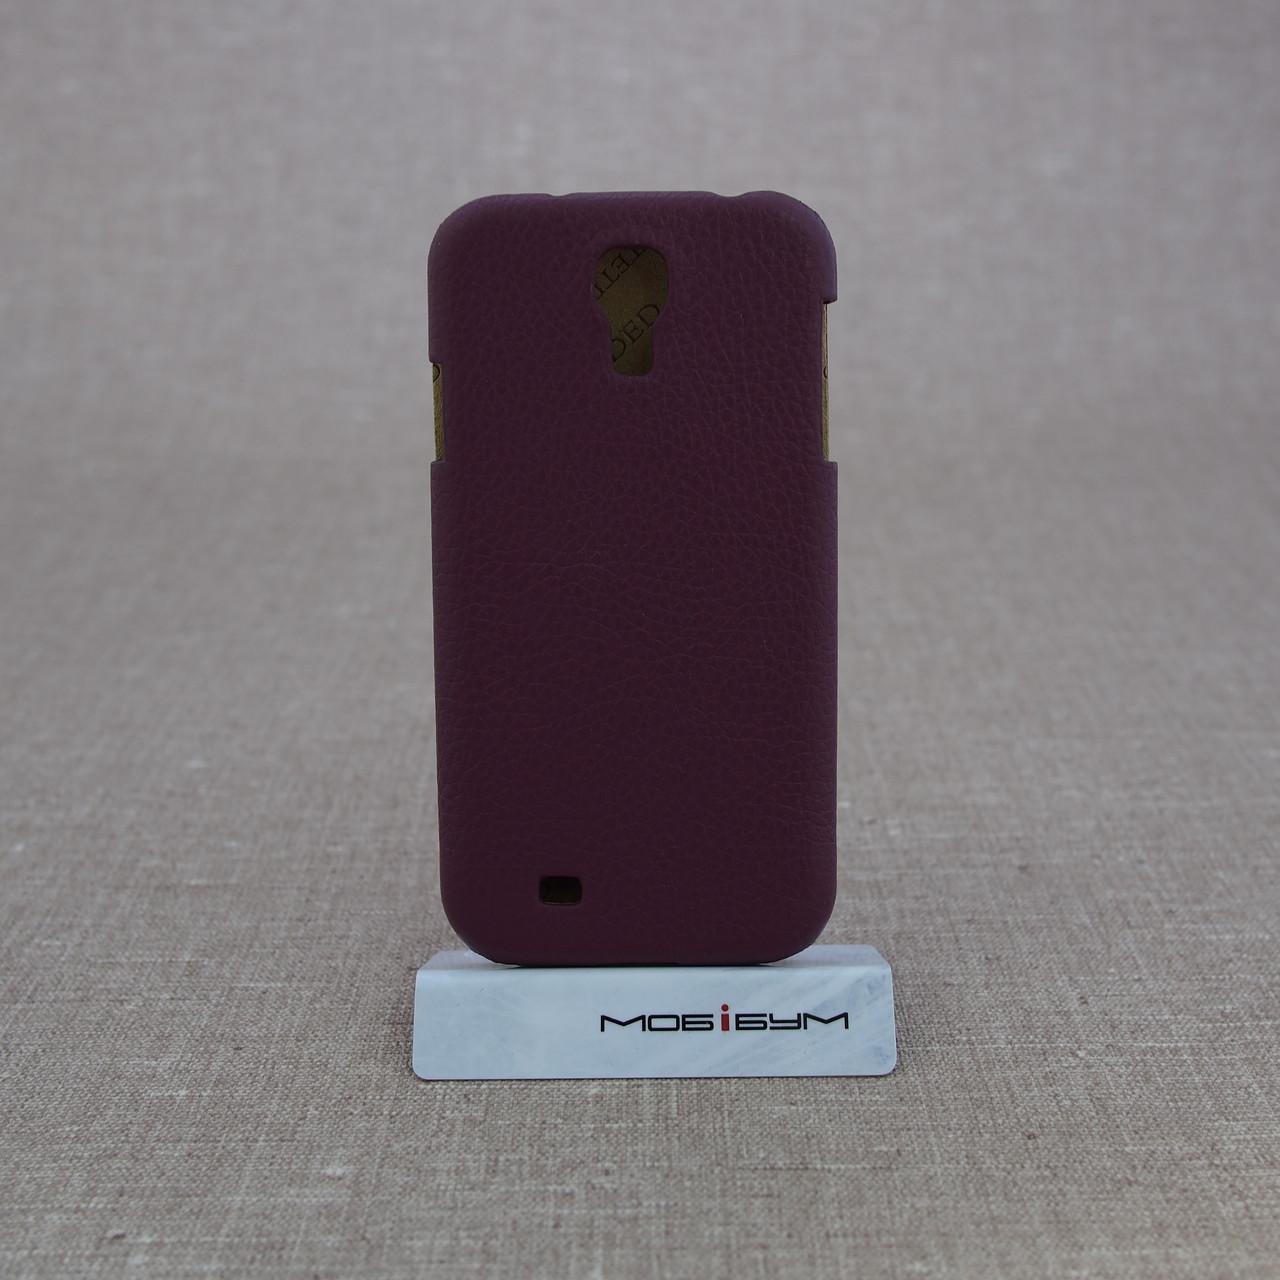 TETDED Samsung Galaxy S4 purple Для телефона Tetded